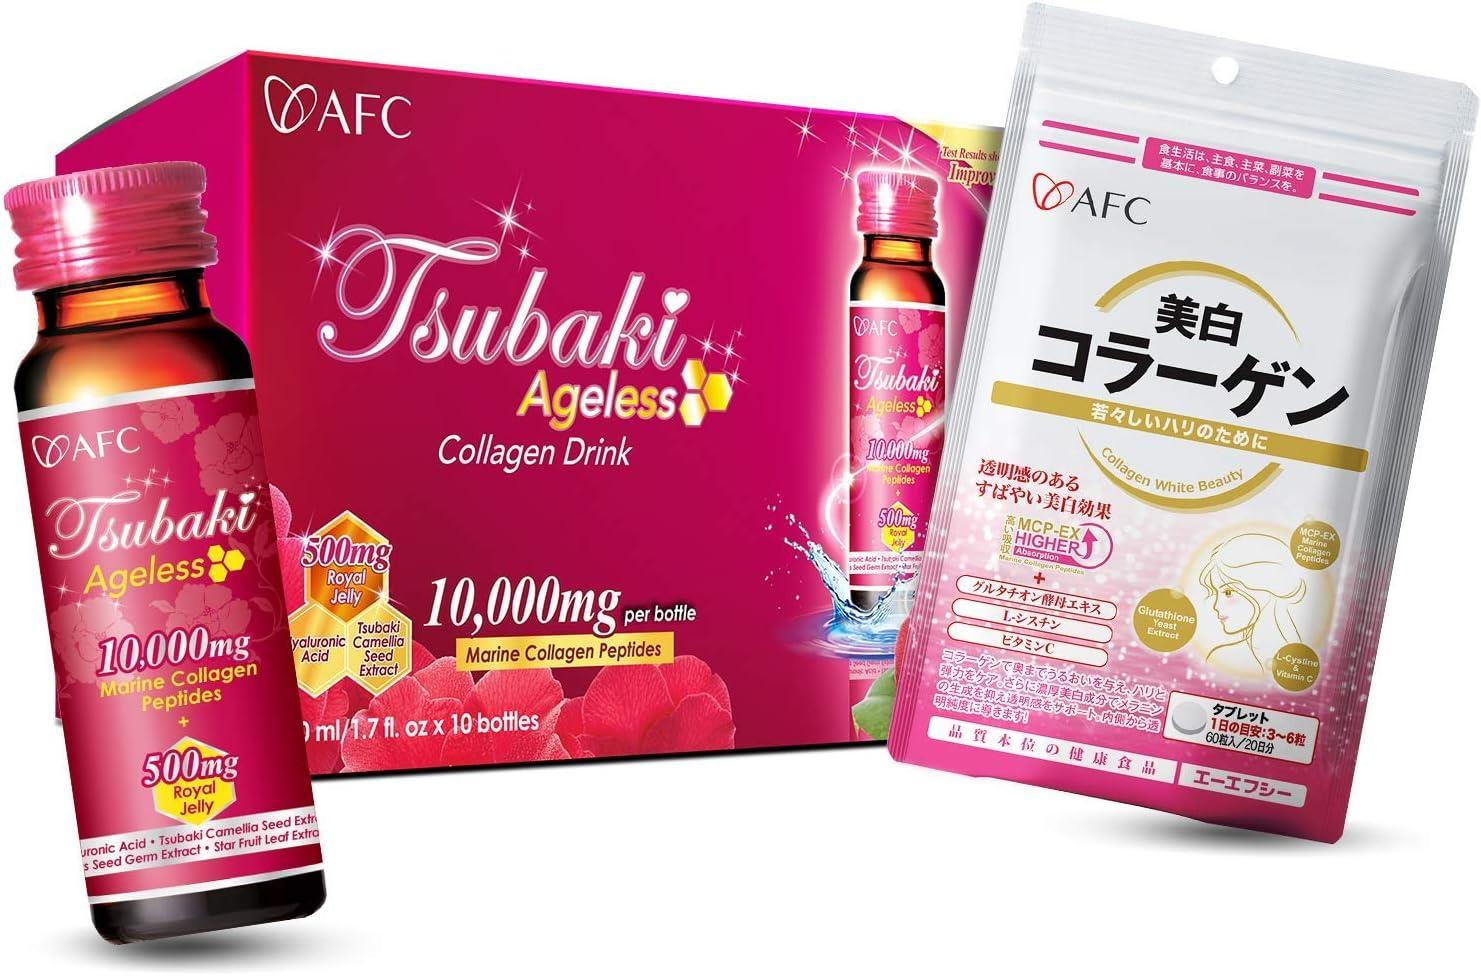 AFC Japan Tsubaki Ageless Beauty Collagen Drink + Collagen White Beauty, Marine Collagen Peptide, Royal Jelly, Hyaluronic Acid, Glutathione, for Skin Revitalization, Firmness & Whitening